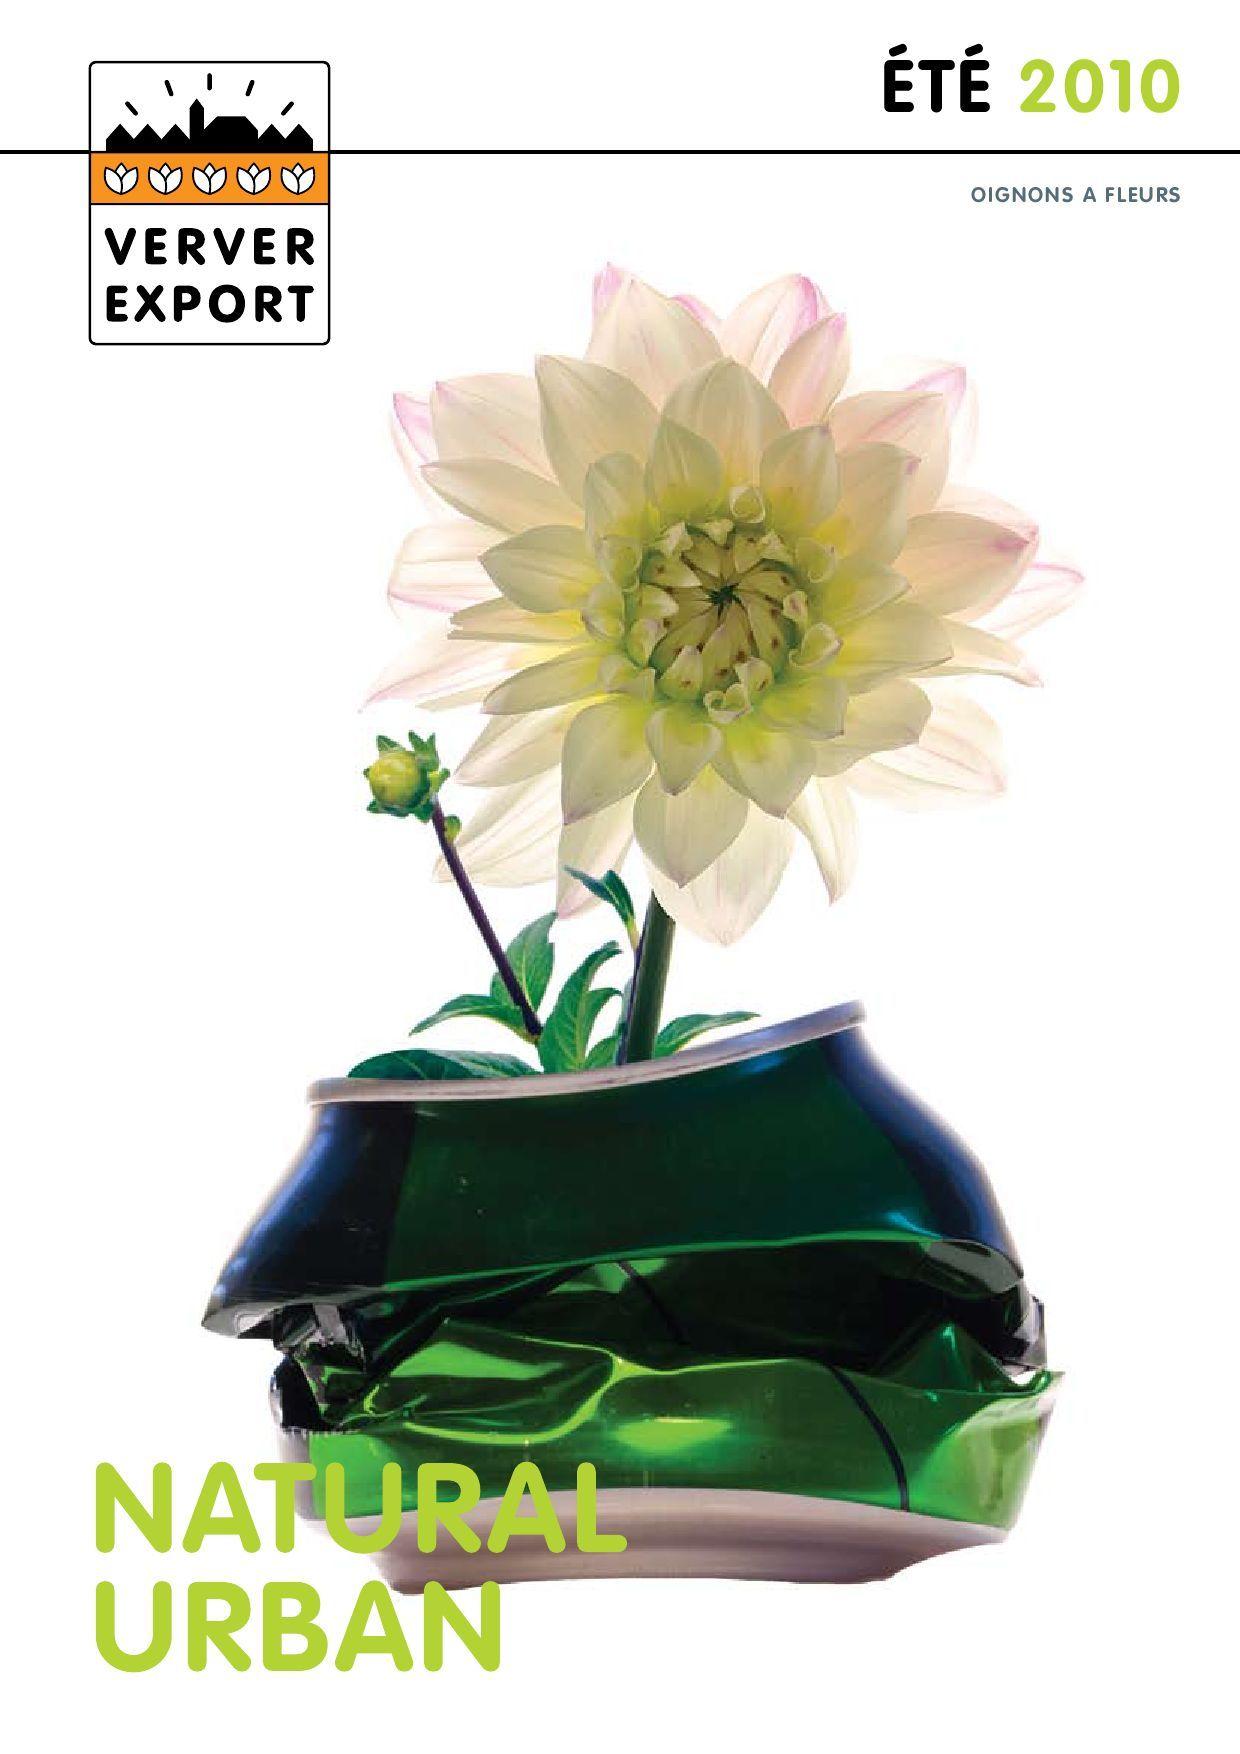 Verver Export catalogue été 2010